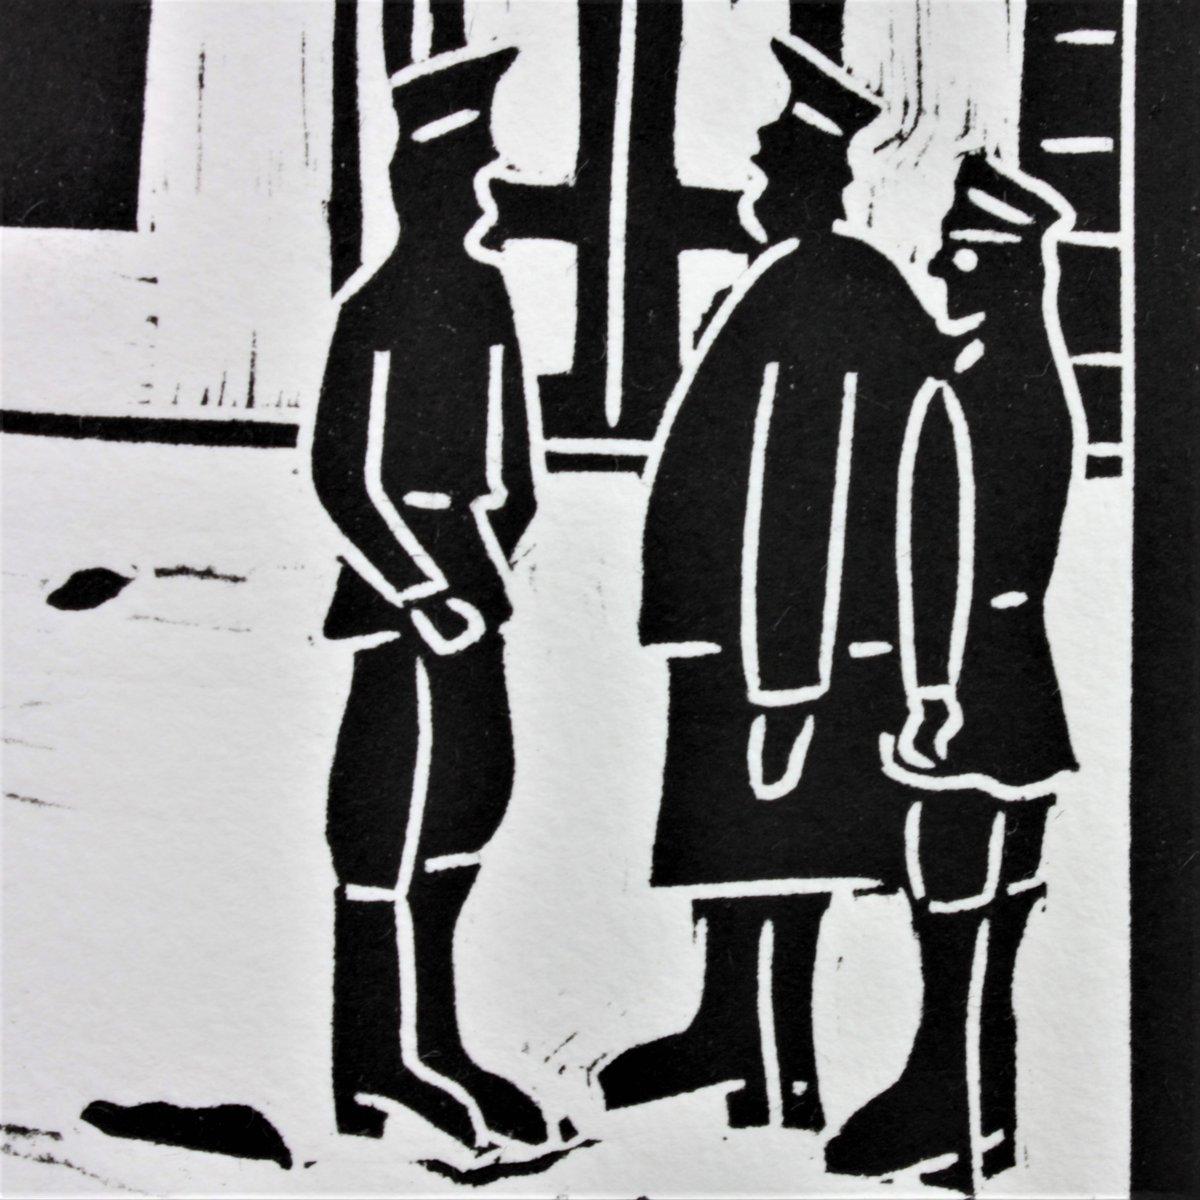 Image of Edirne, 1923